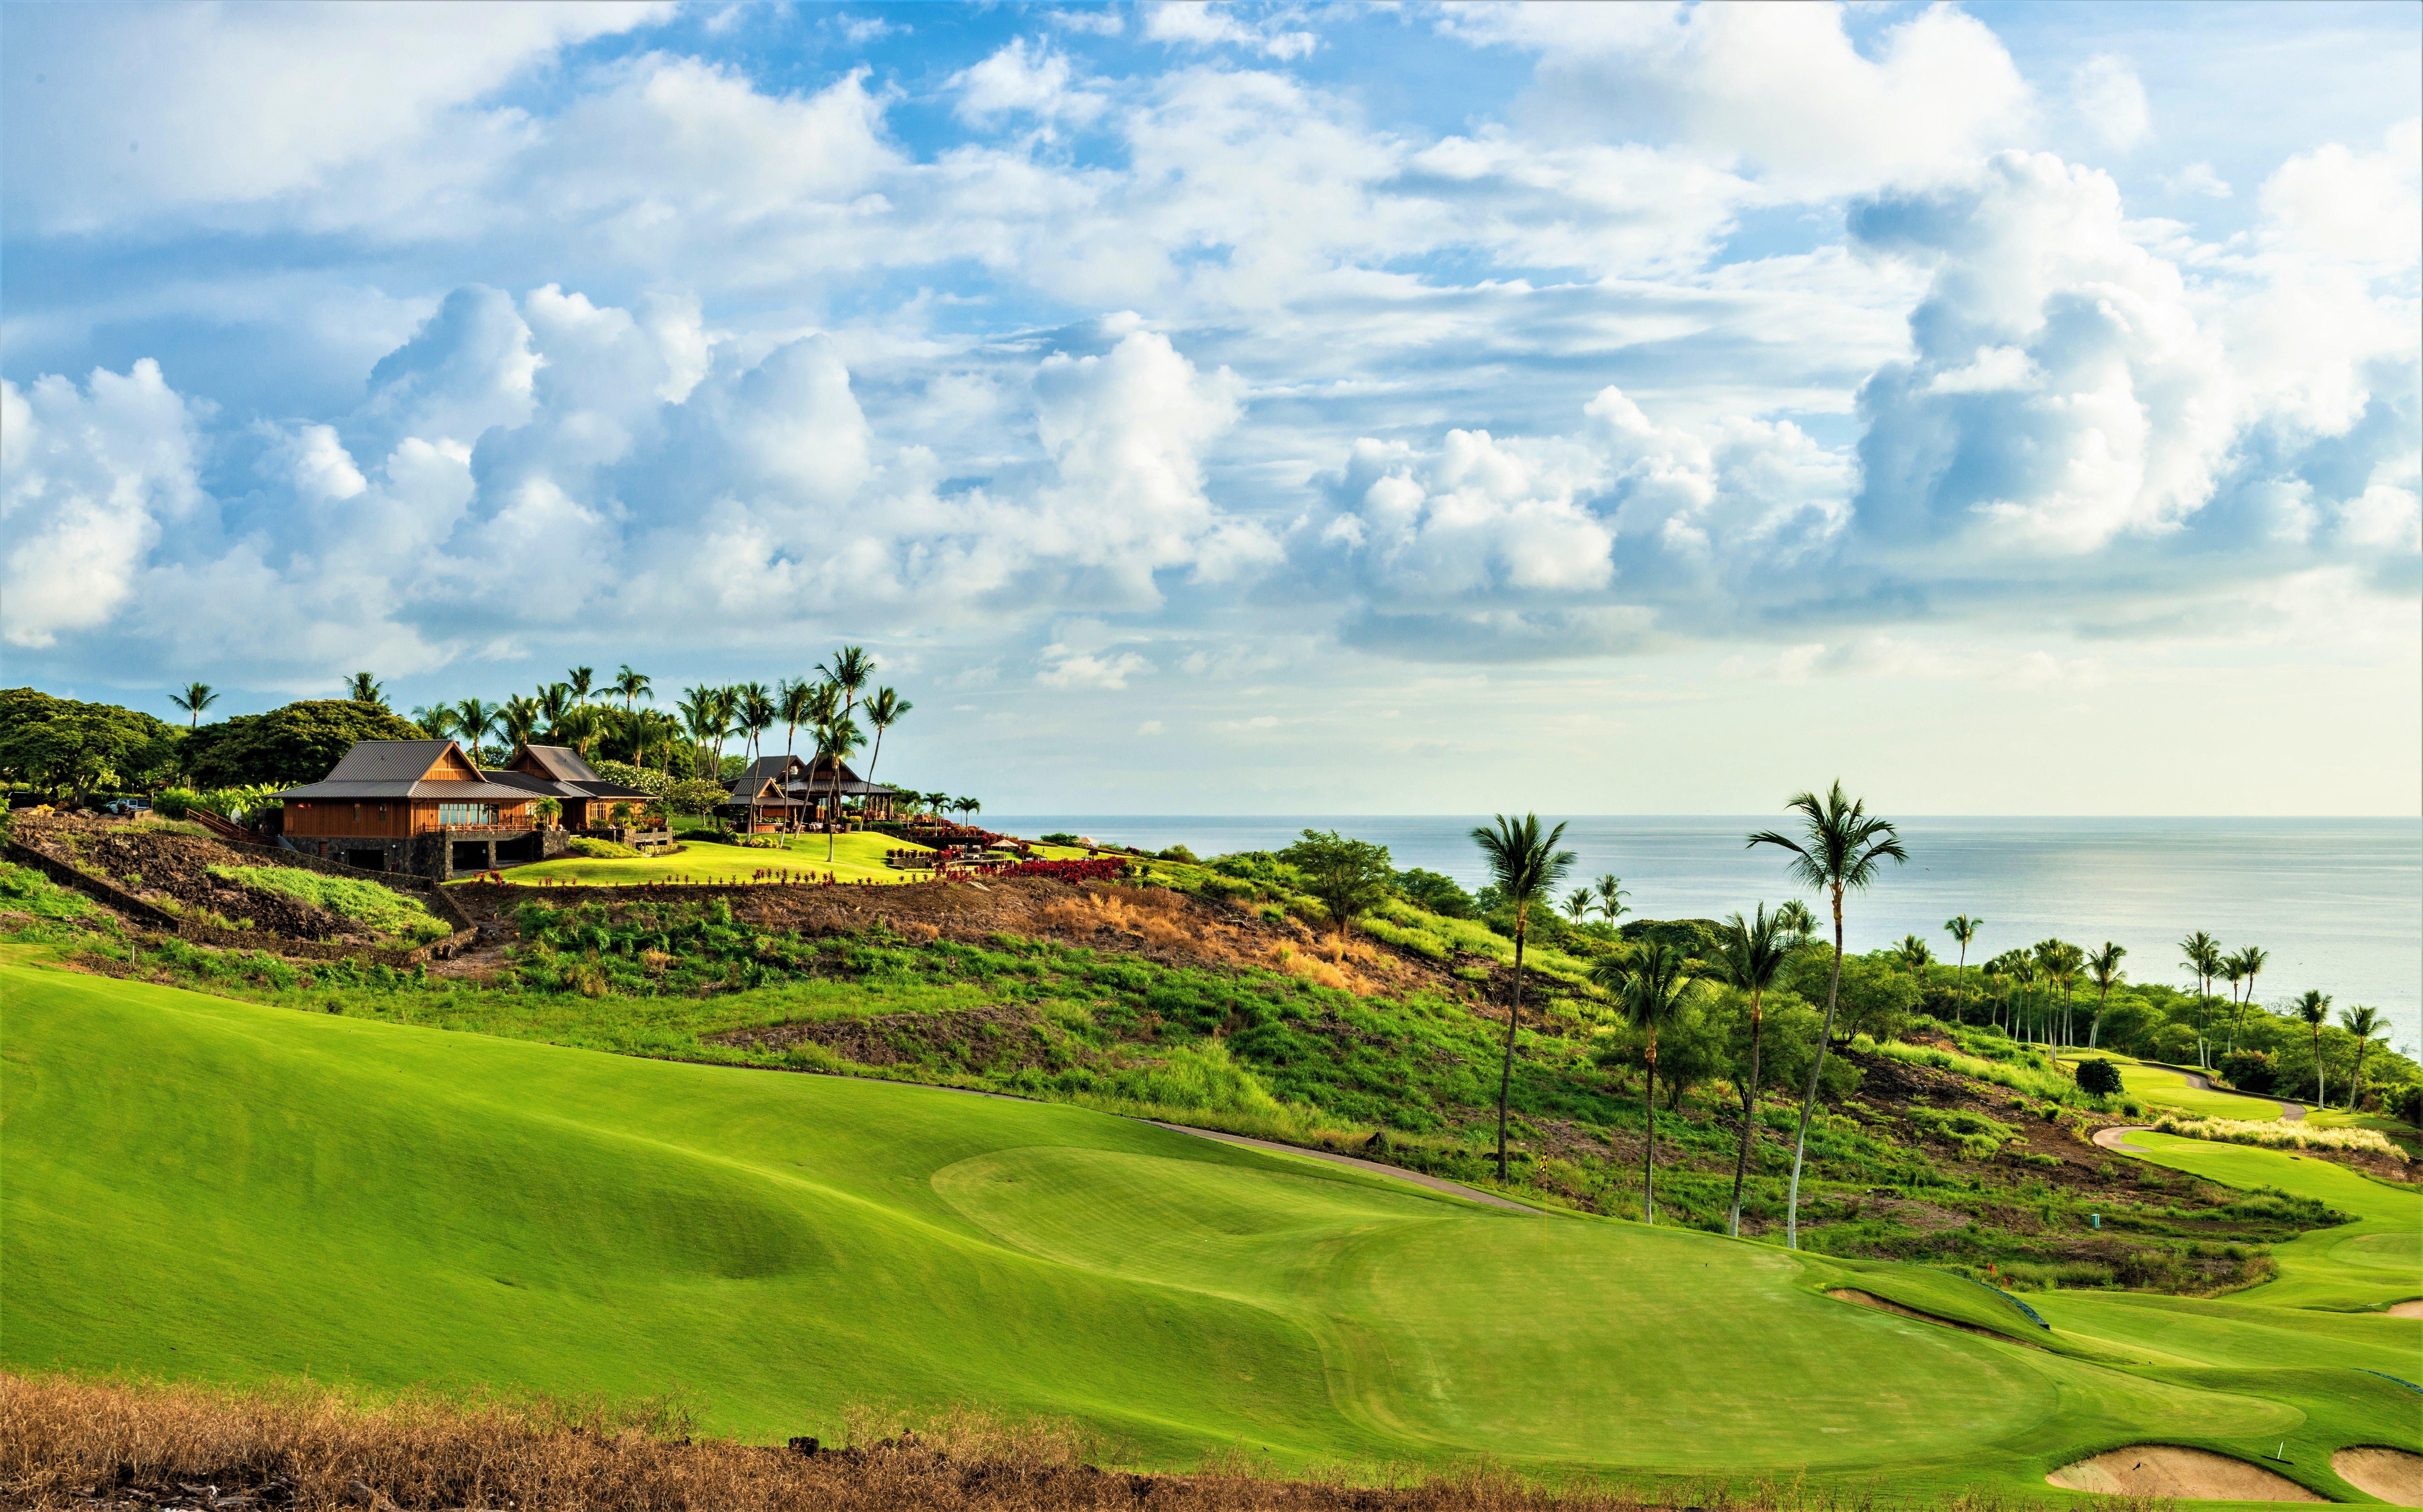 golf course views at hokulia